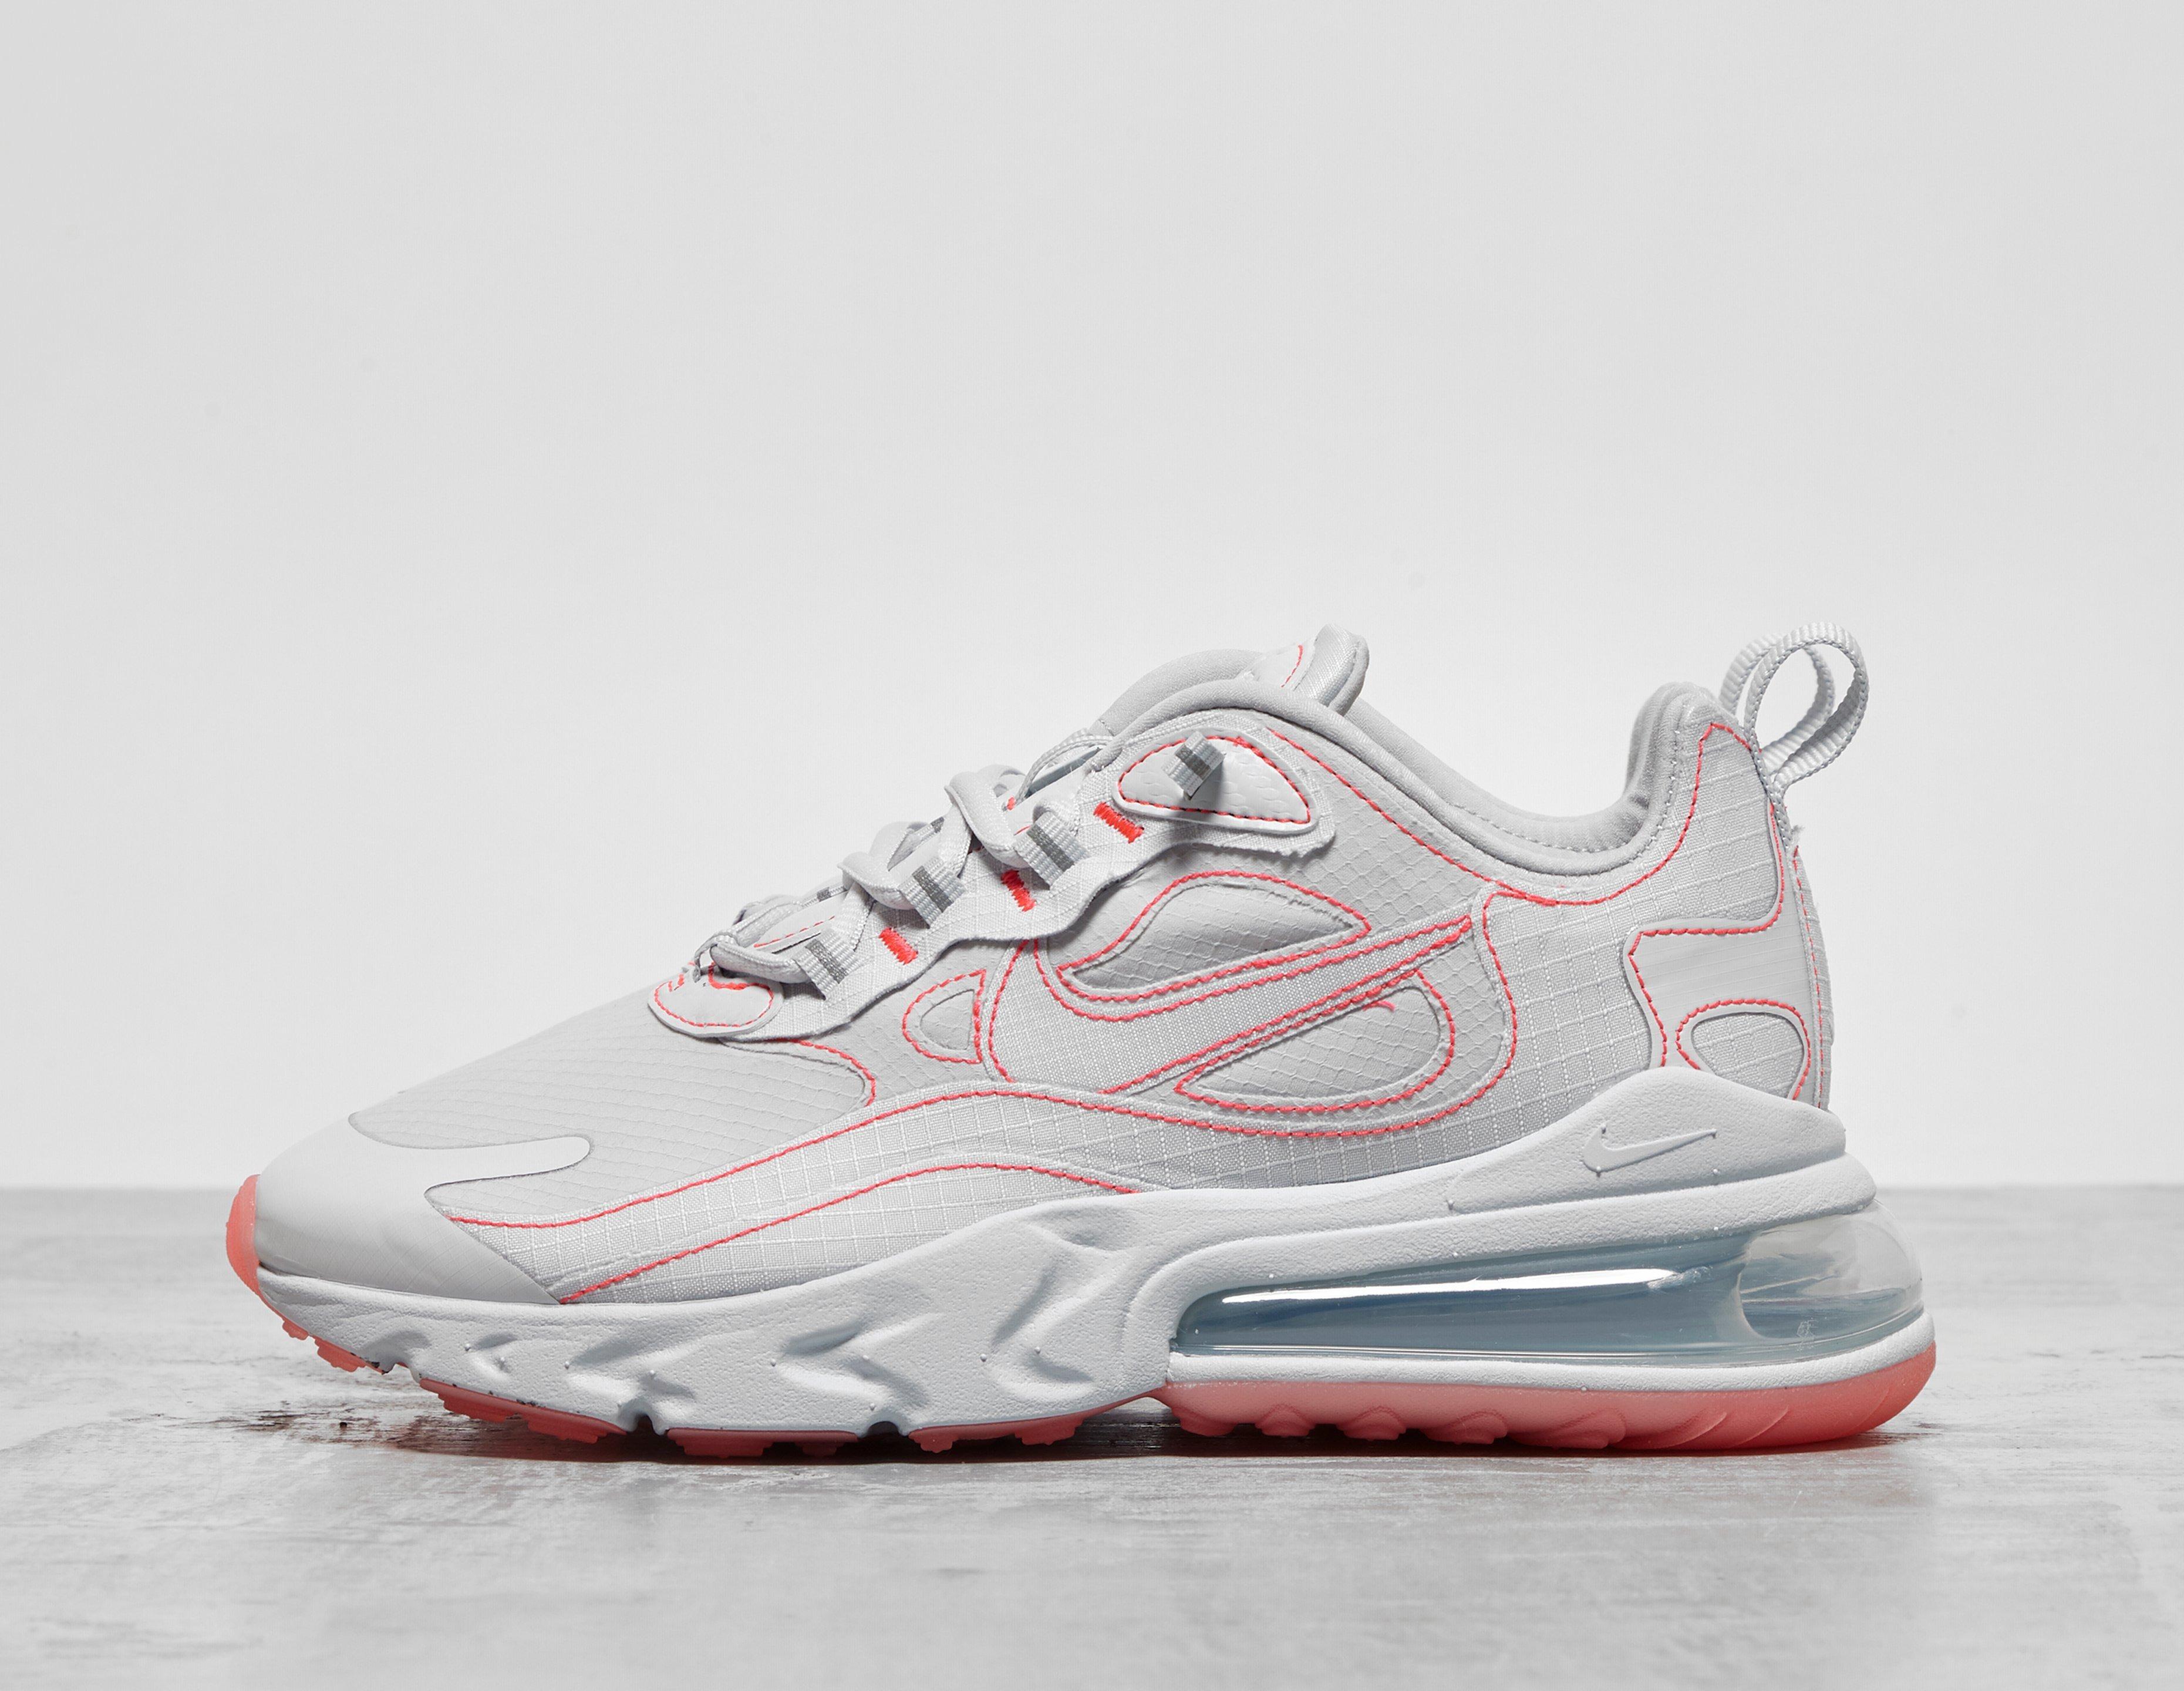 Nike Air Max 270 React SP Donna | Footpatrol